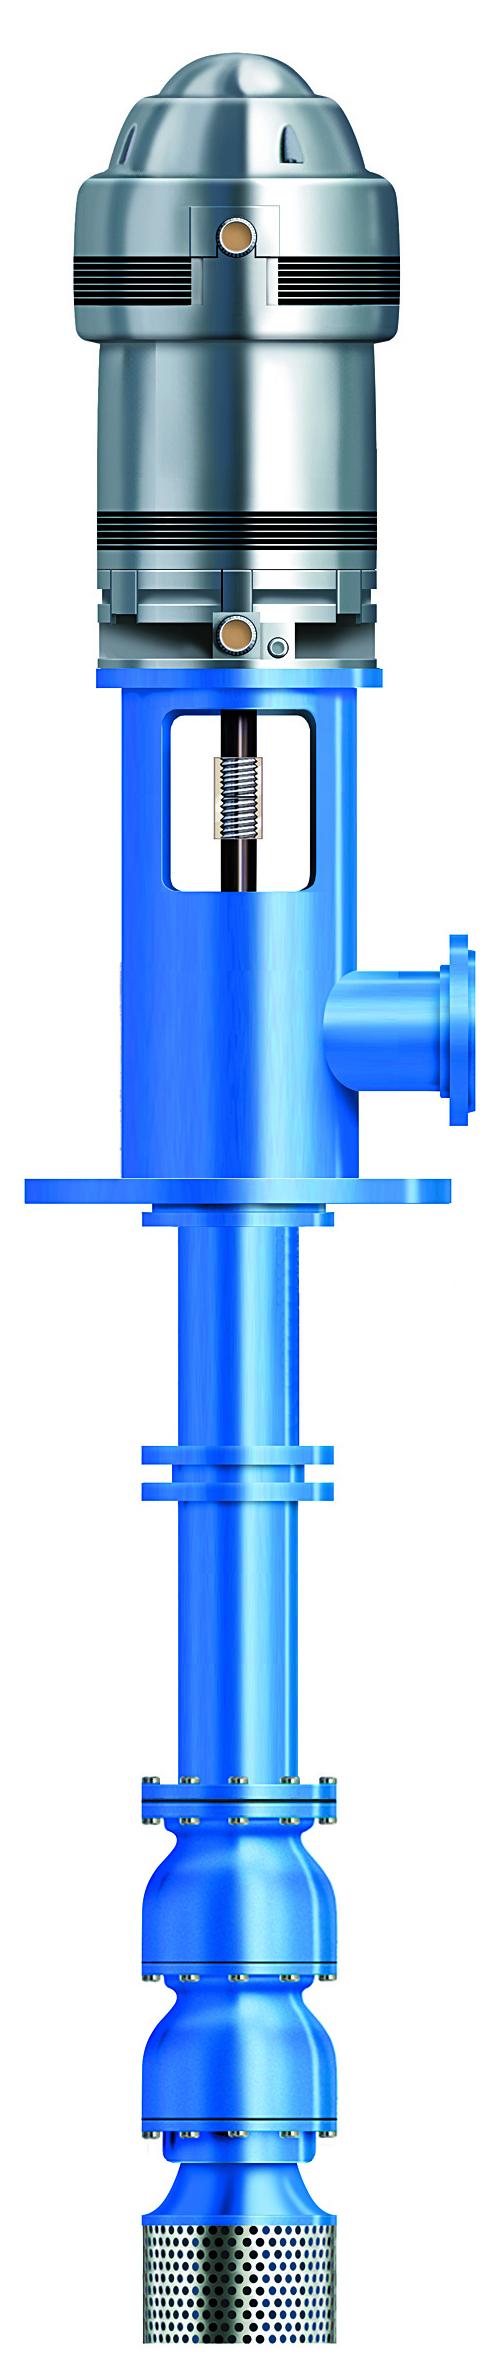 VIT – Short Set Lineshaft Turbine Pumps